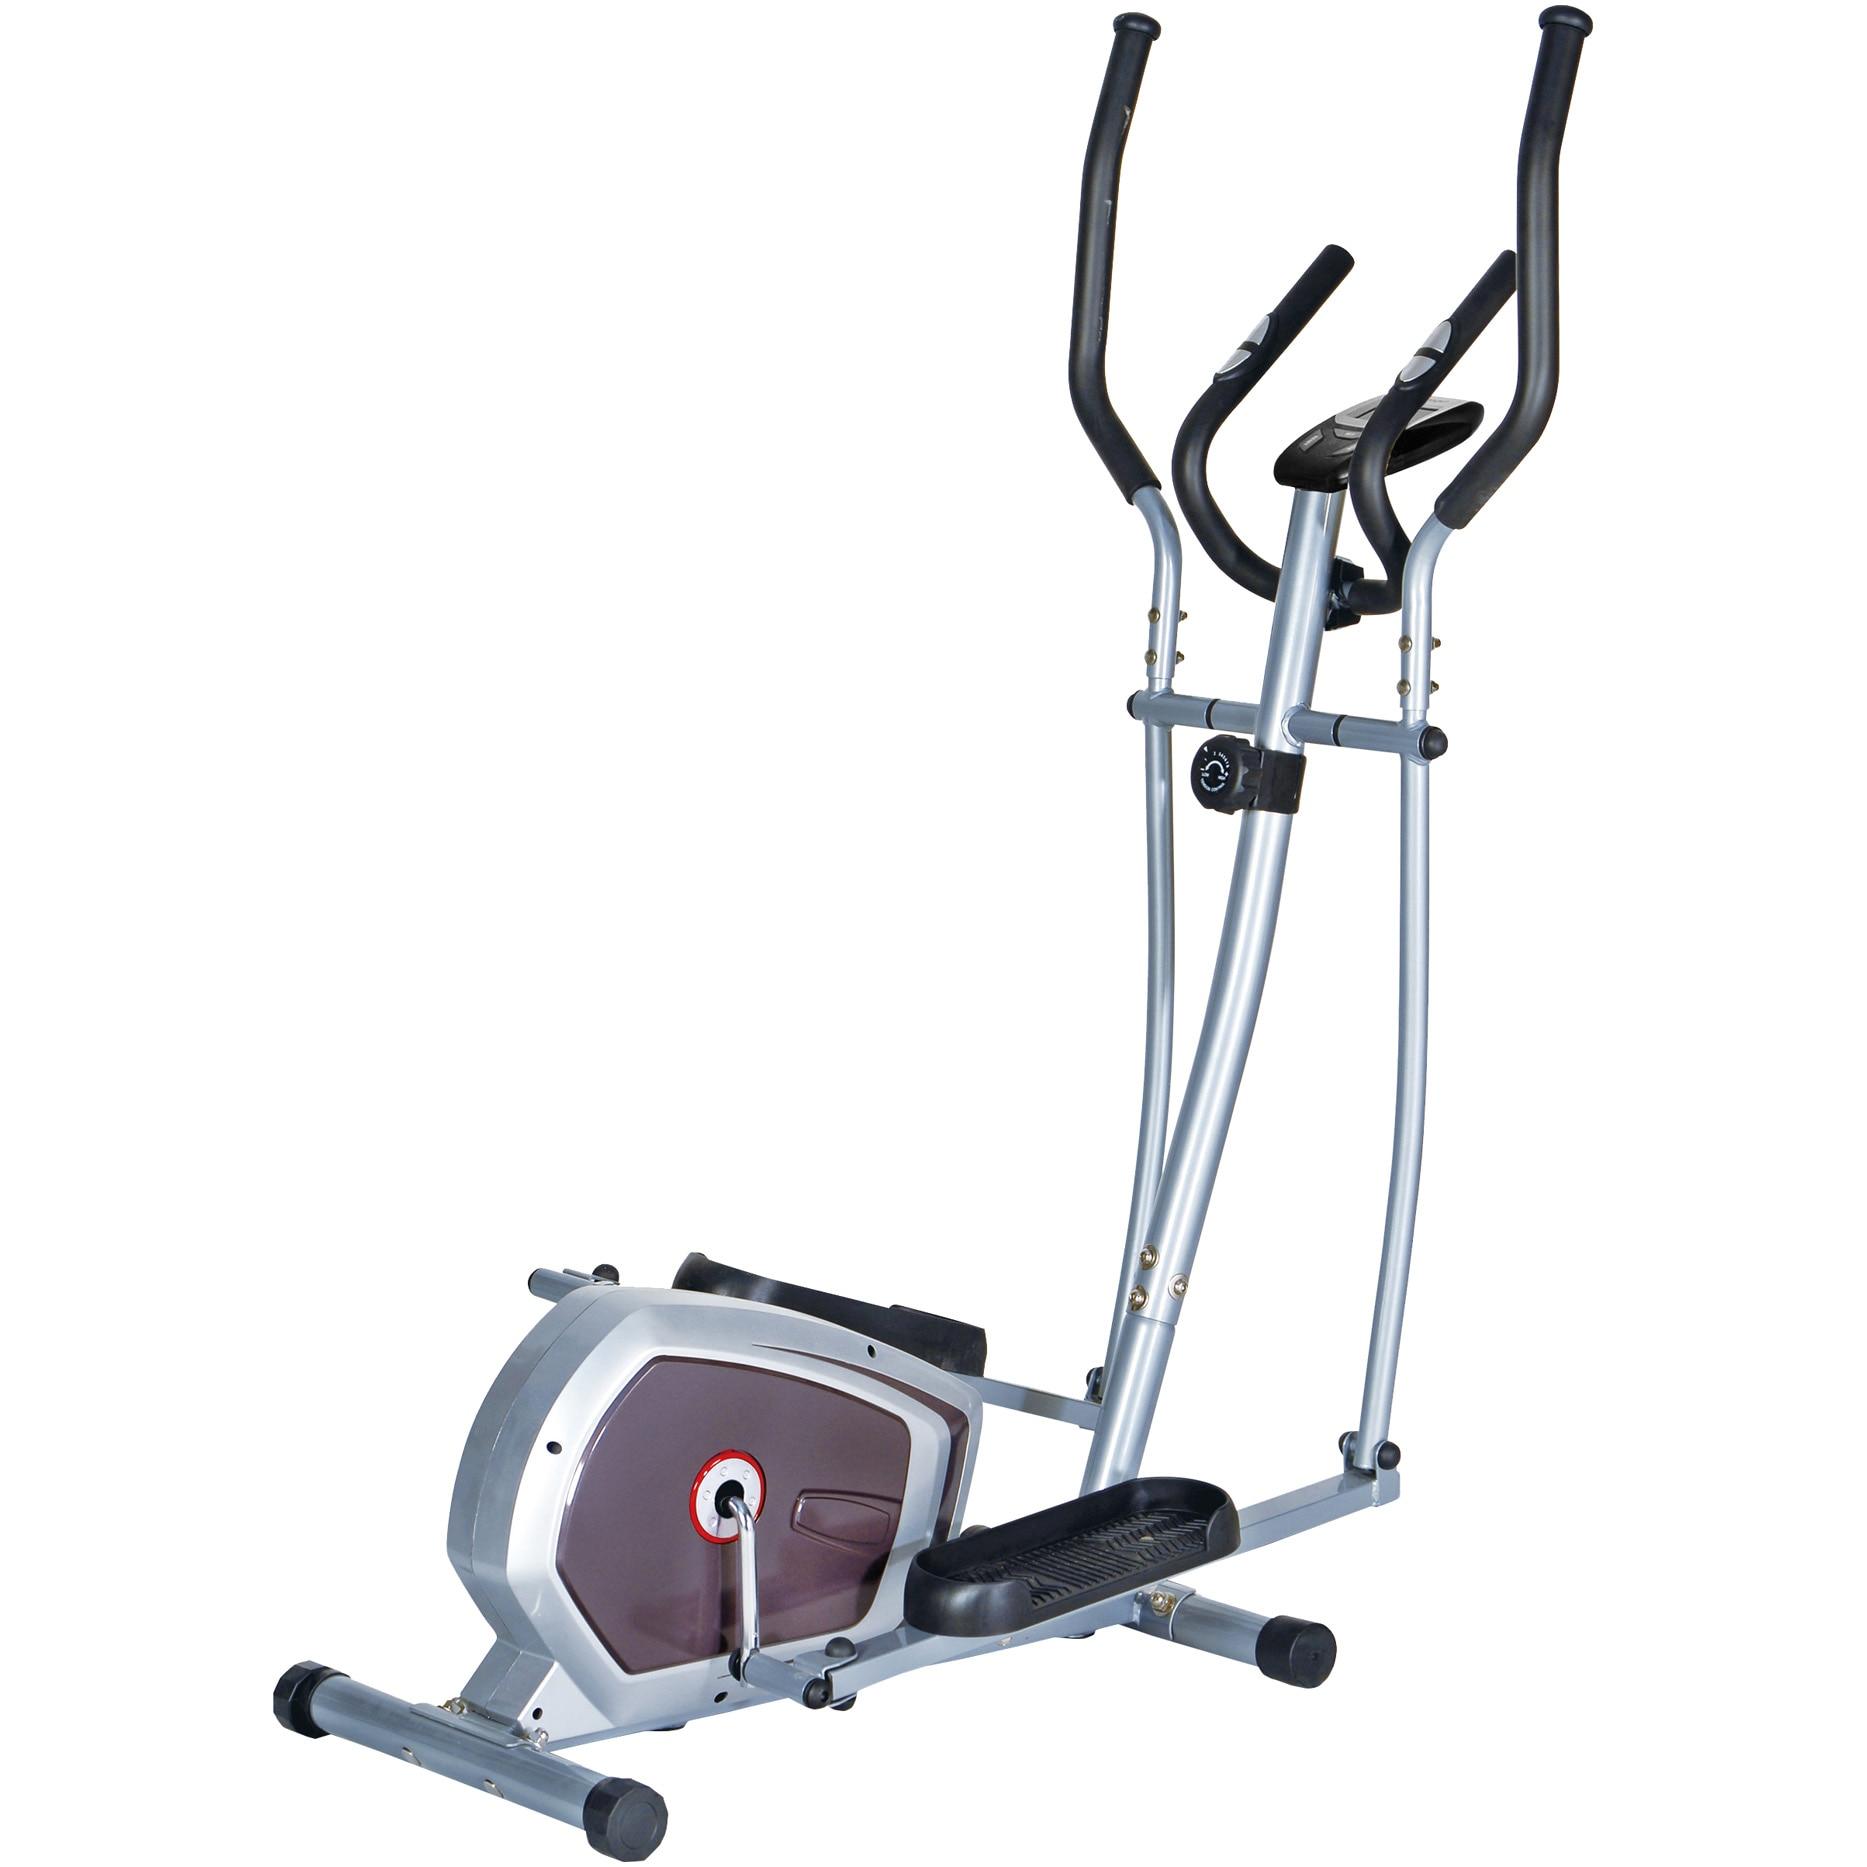 Fotografie Bicicleta fitness eliptica DYNAMIC E16, volanta 5 kg, greutate maxima utilizator 100 kg